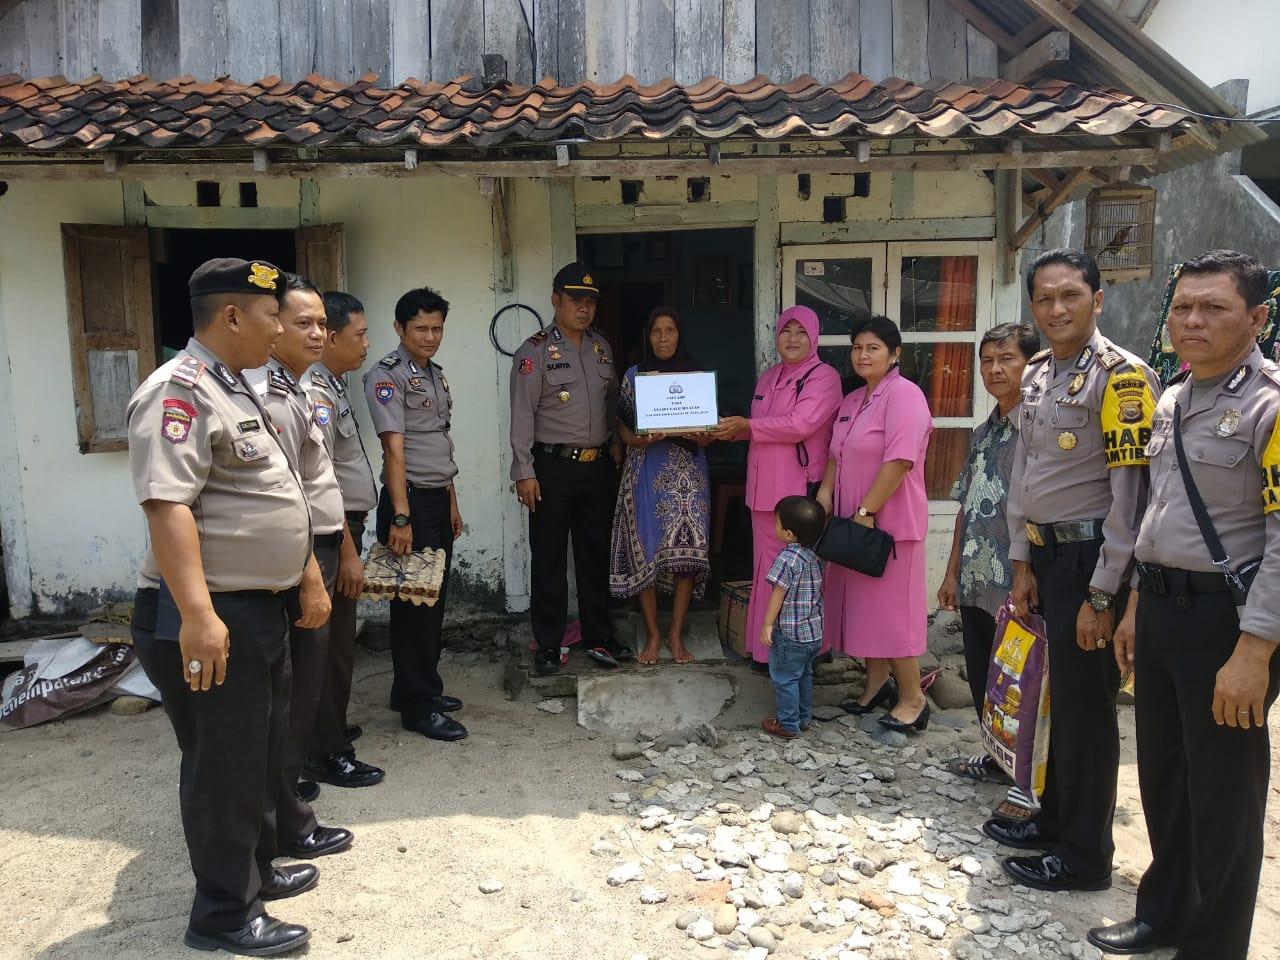 Didampingi Anggota dan Bhayangkari, Kapolsek Kaur Selatan Bagi Tali Asih